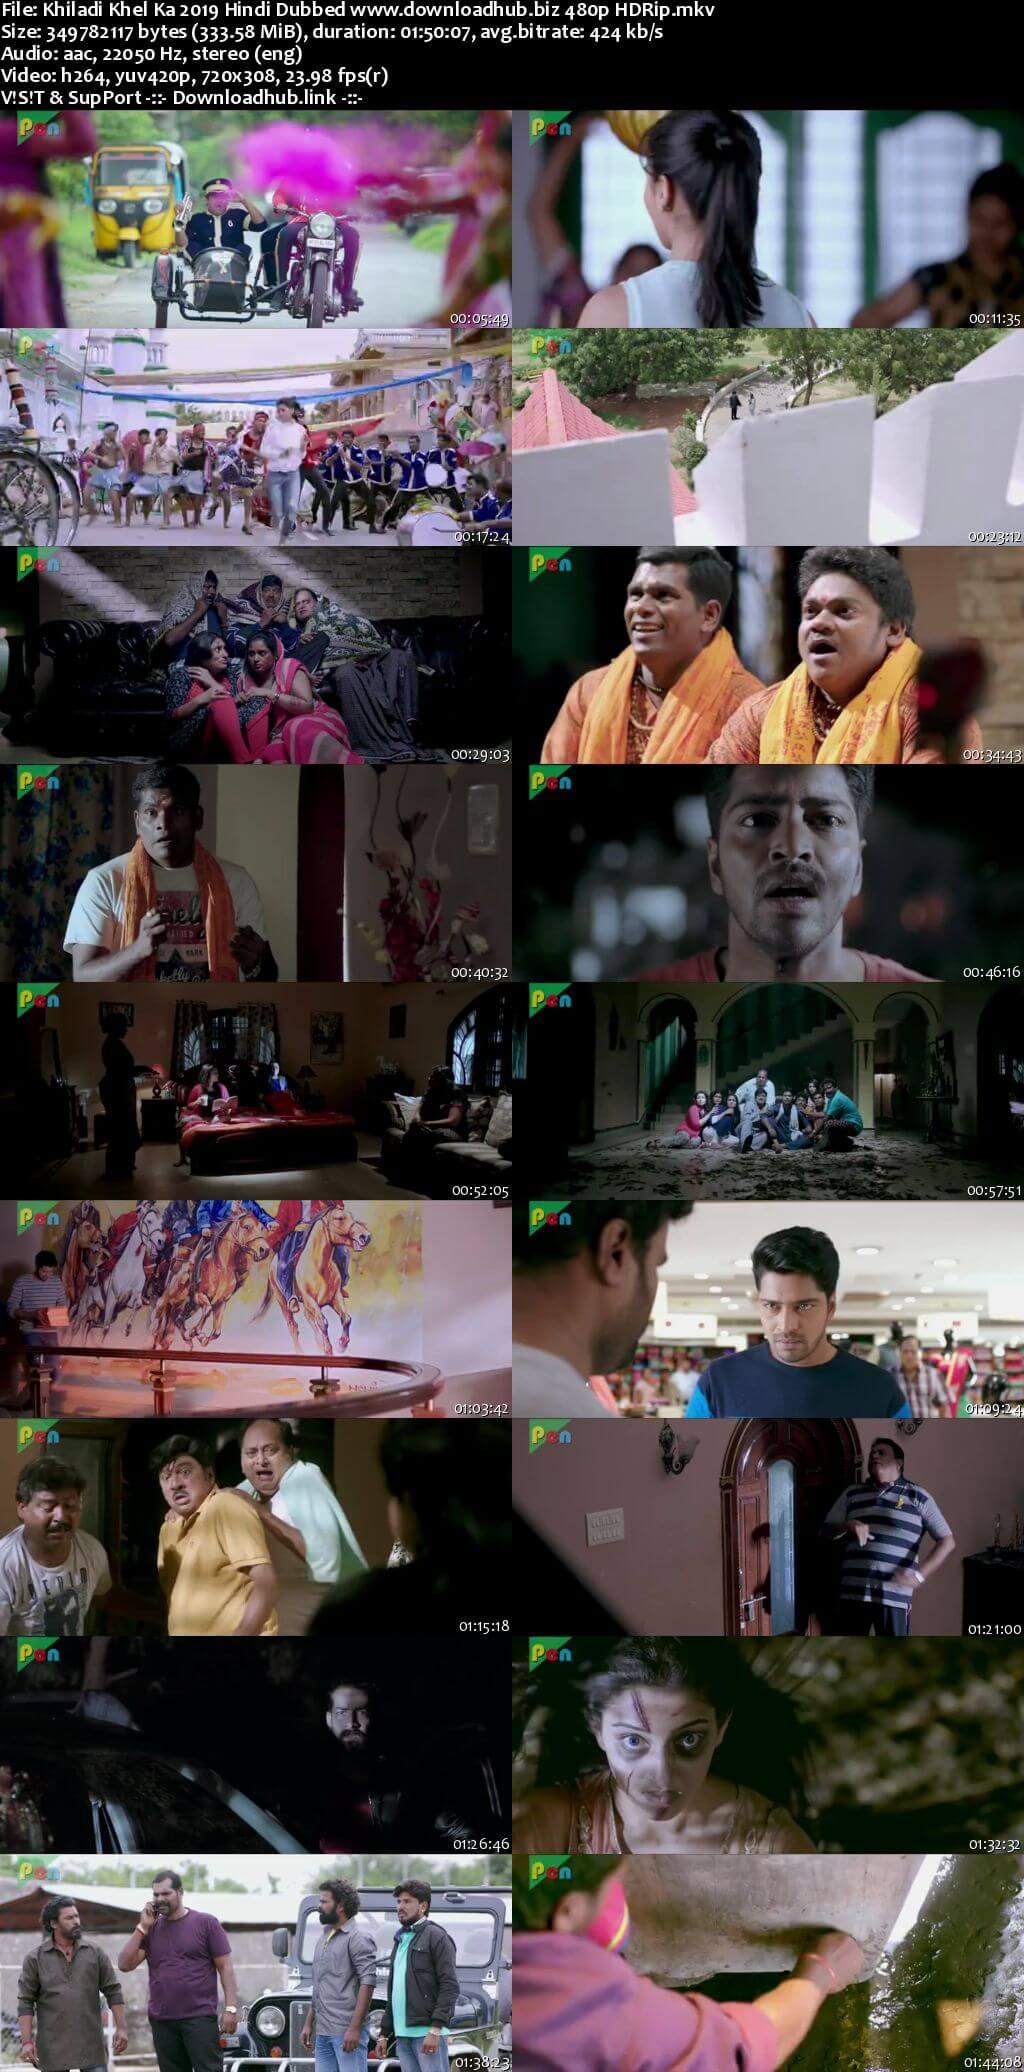 Khiladi Khel Ka 2019 Hindi Dubbed 300MB HDRip 480p